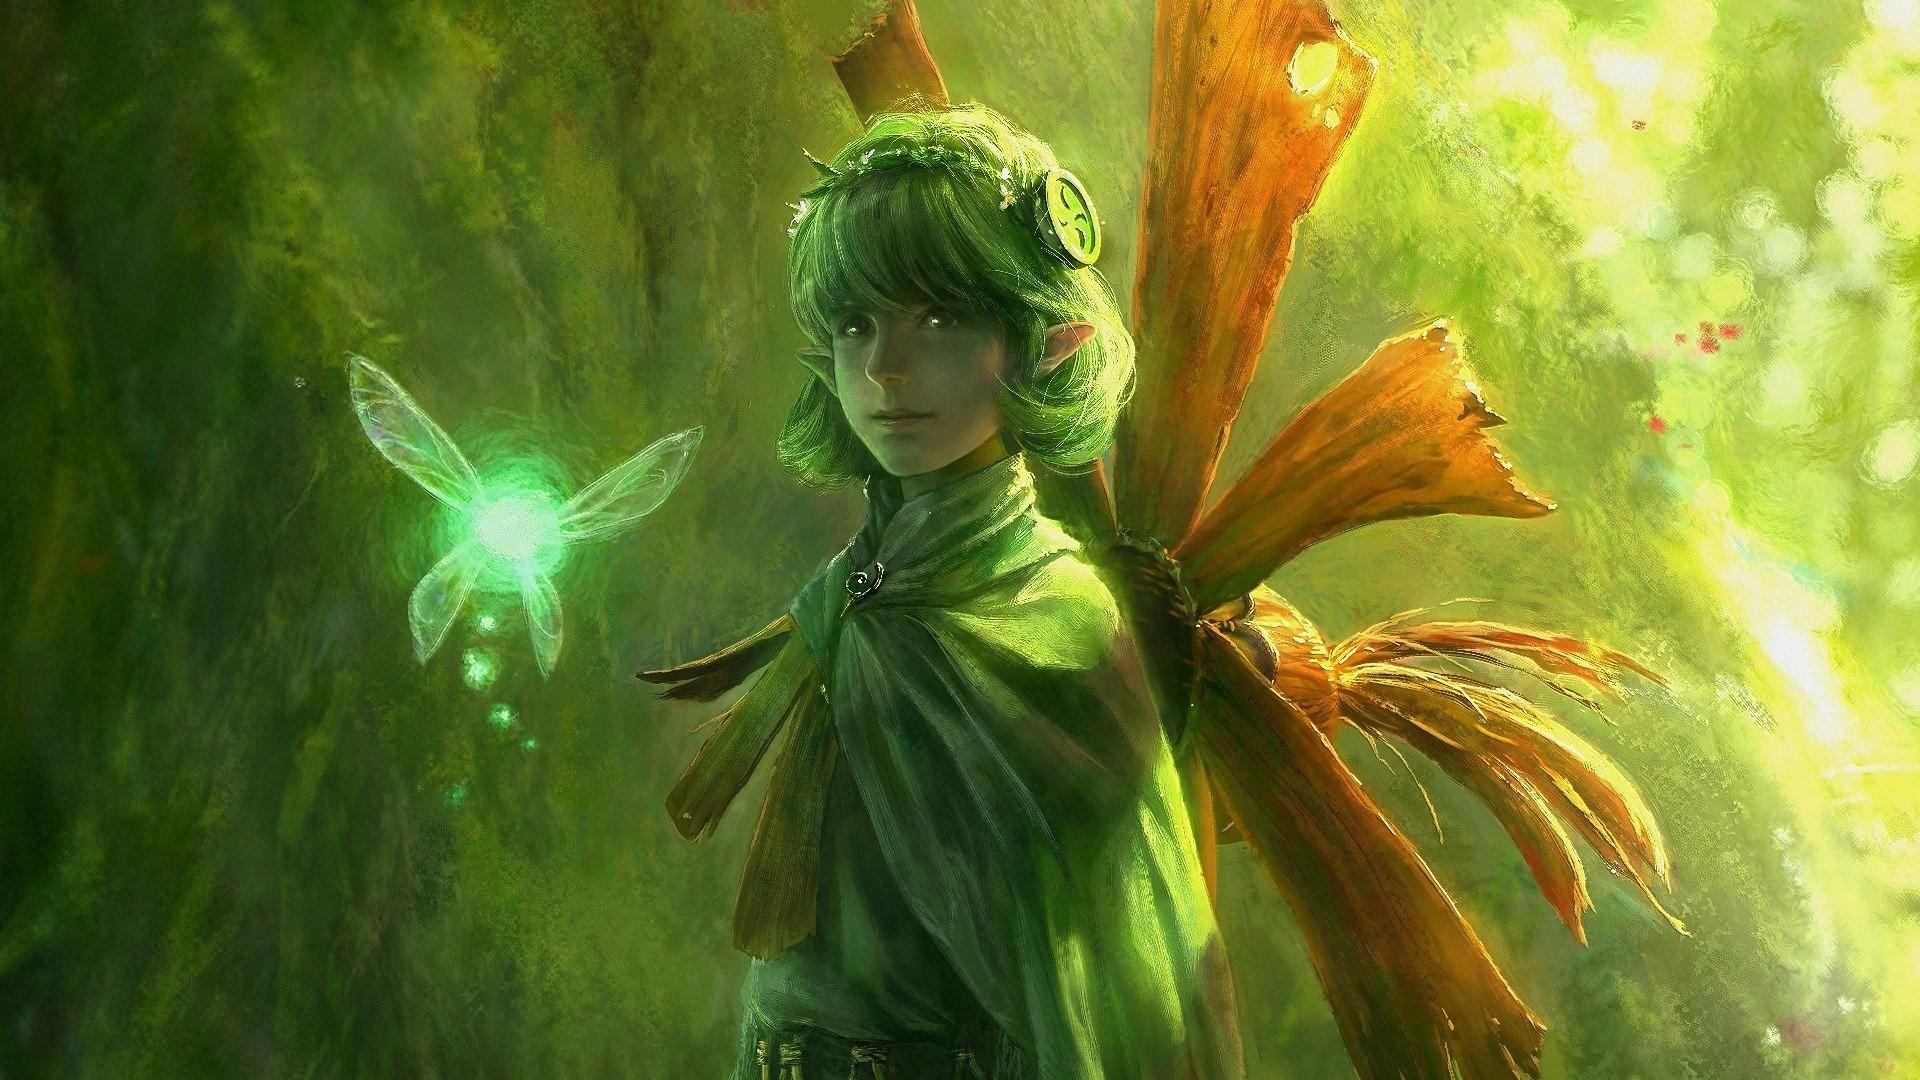 Legend Of Zelda Ocarina Of Time Wallpapers Widescreen …